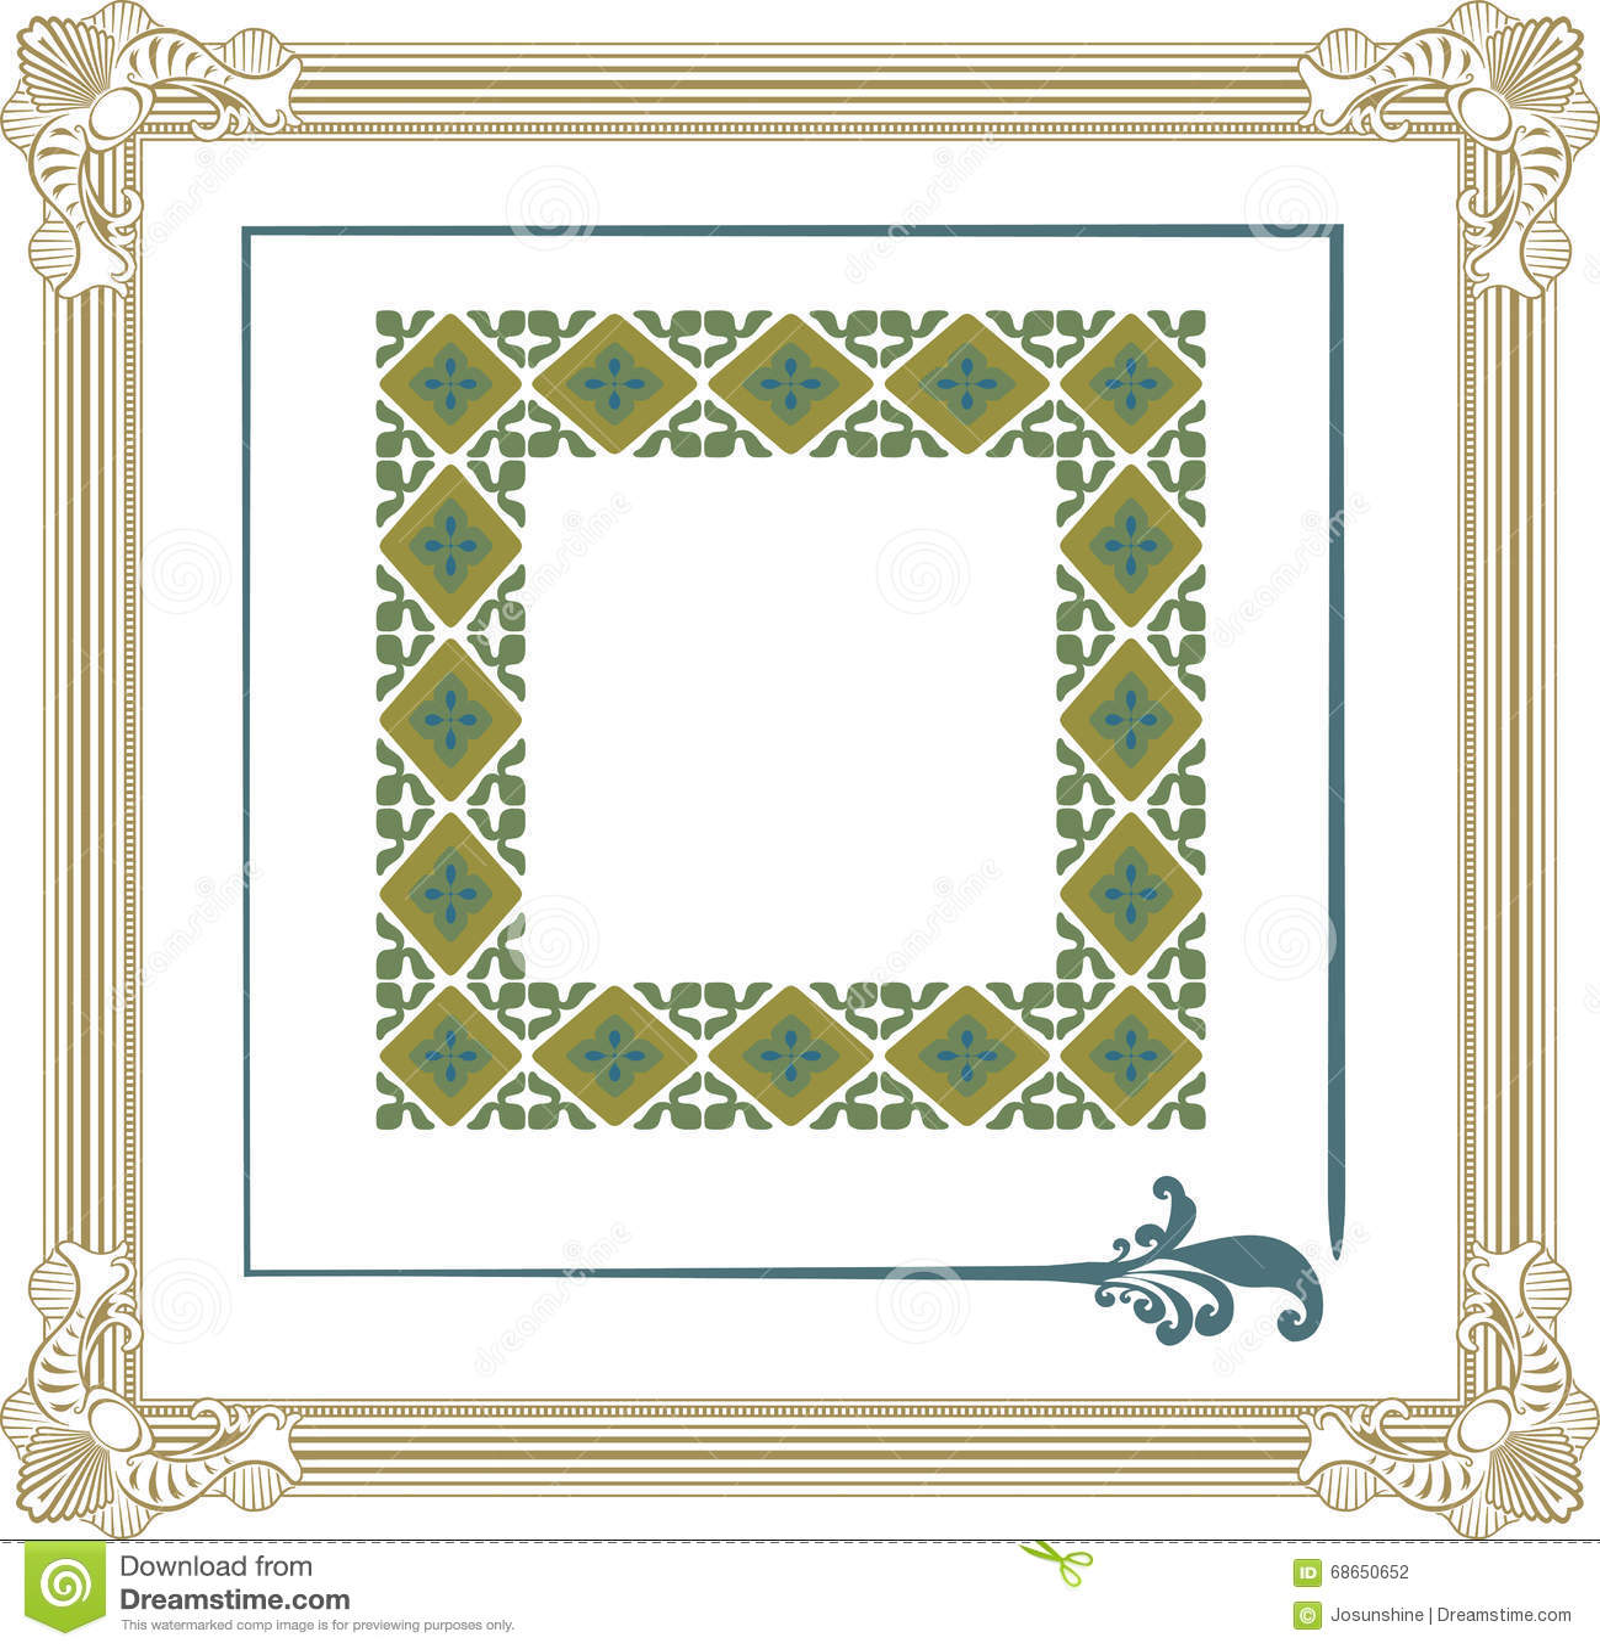 3 Unique Frames Vector stock vector. Illustration of decor - 68650652